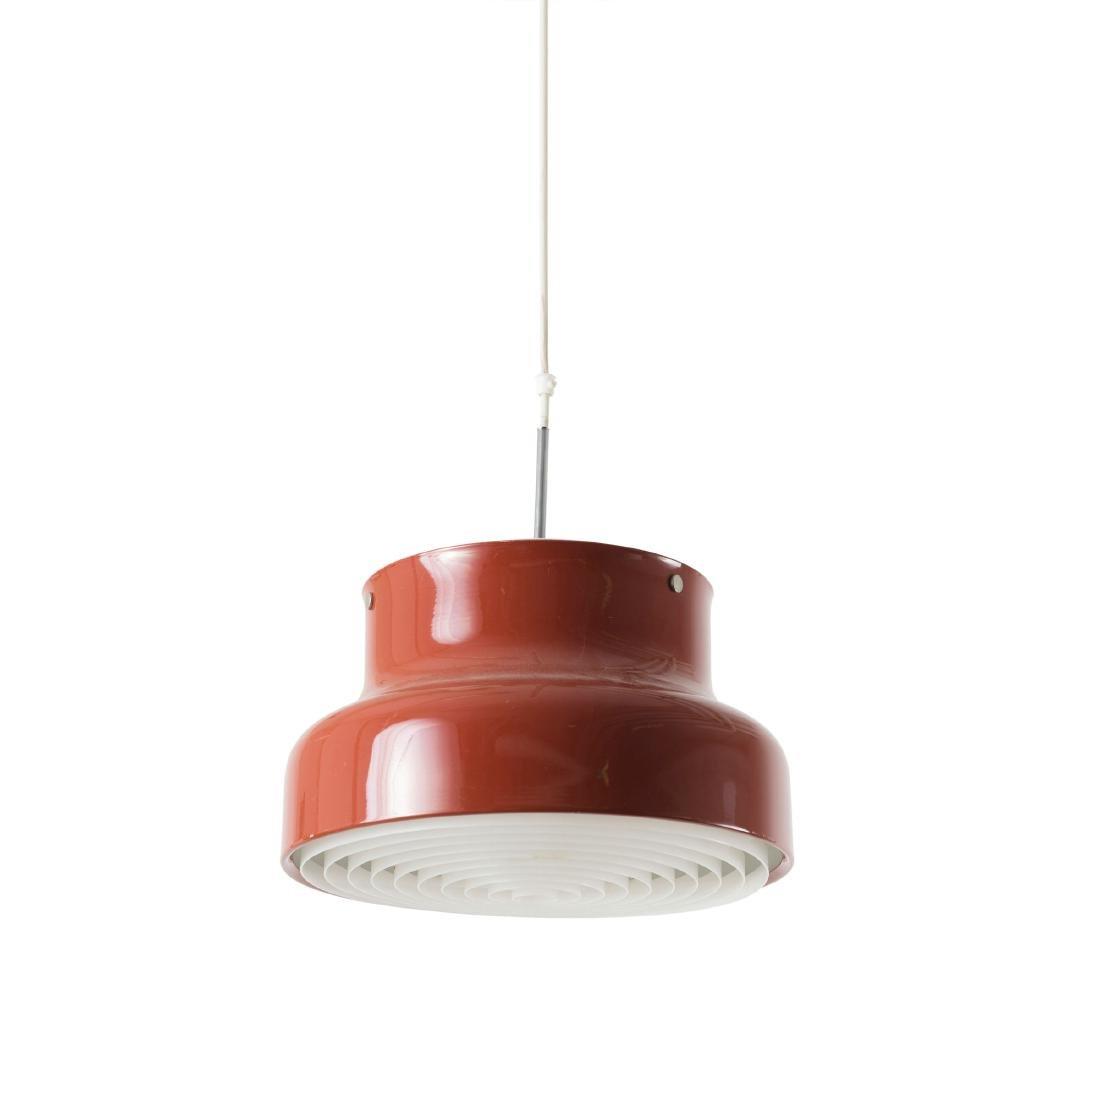 'Bumling' ceiling light, 1968